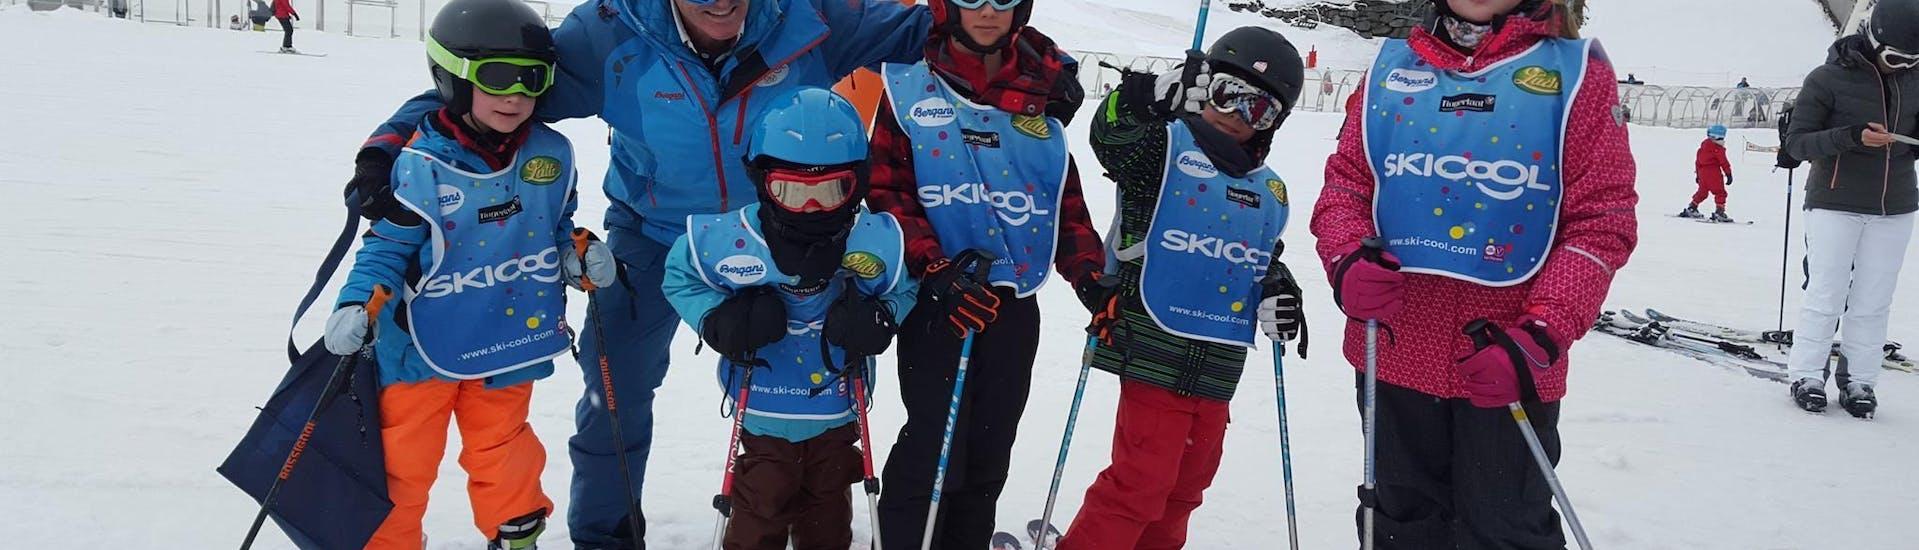 Kids Ski Lessons (5-12 years) - Equipment incl. - Advanced